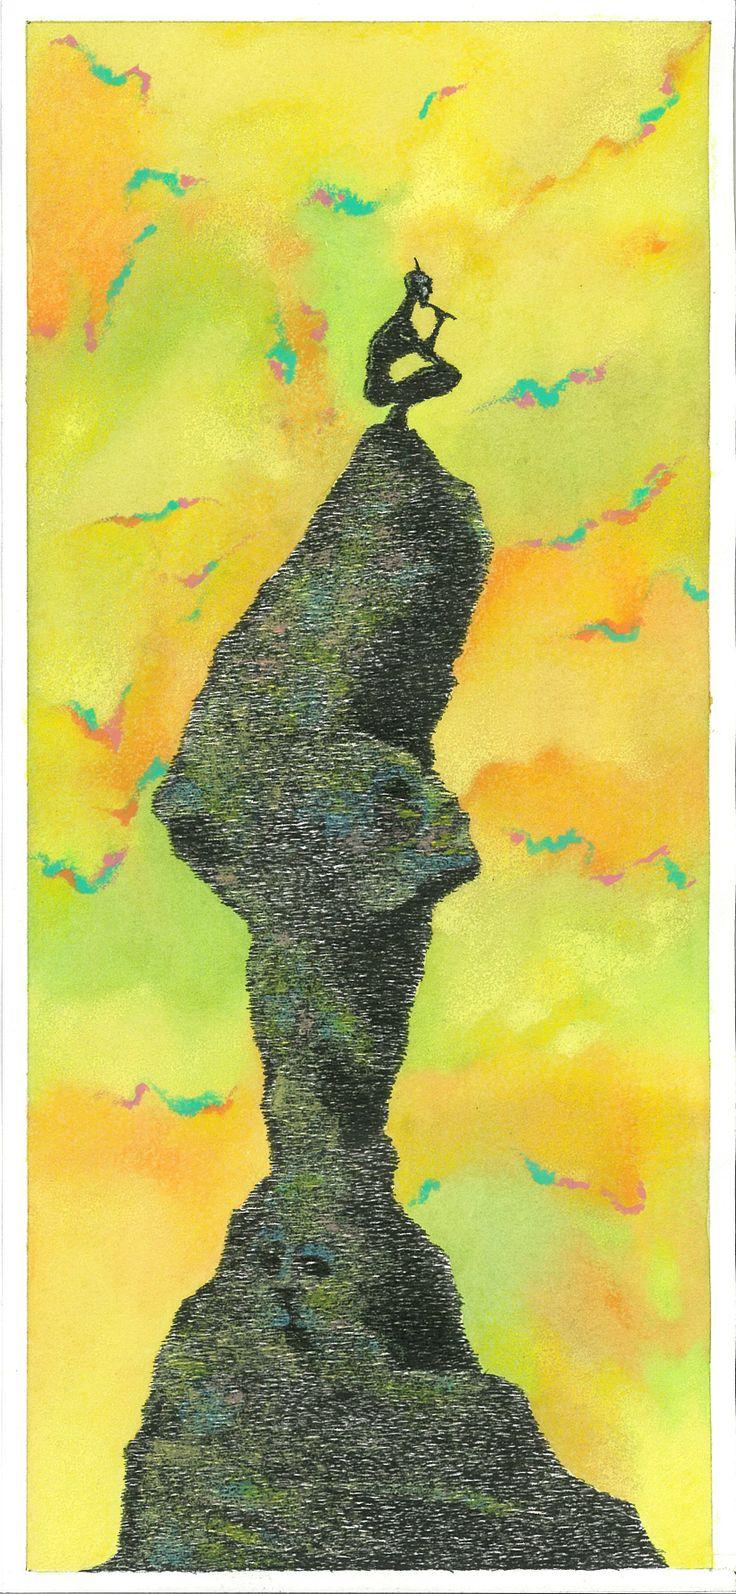 """L'Apres Midi d'un Faune"", 2013  1-Preludio alla conquista ideale di ninfe. China, acquerelli, pastelli a cera - Ink, watercolors, wax crayons."